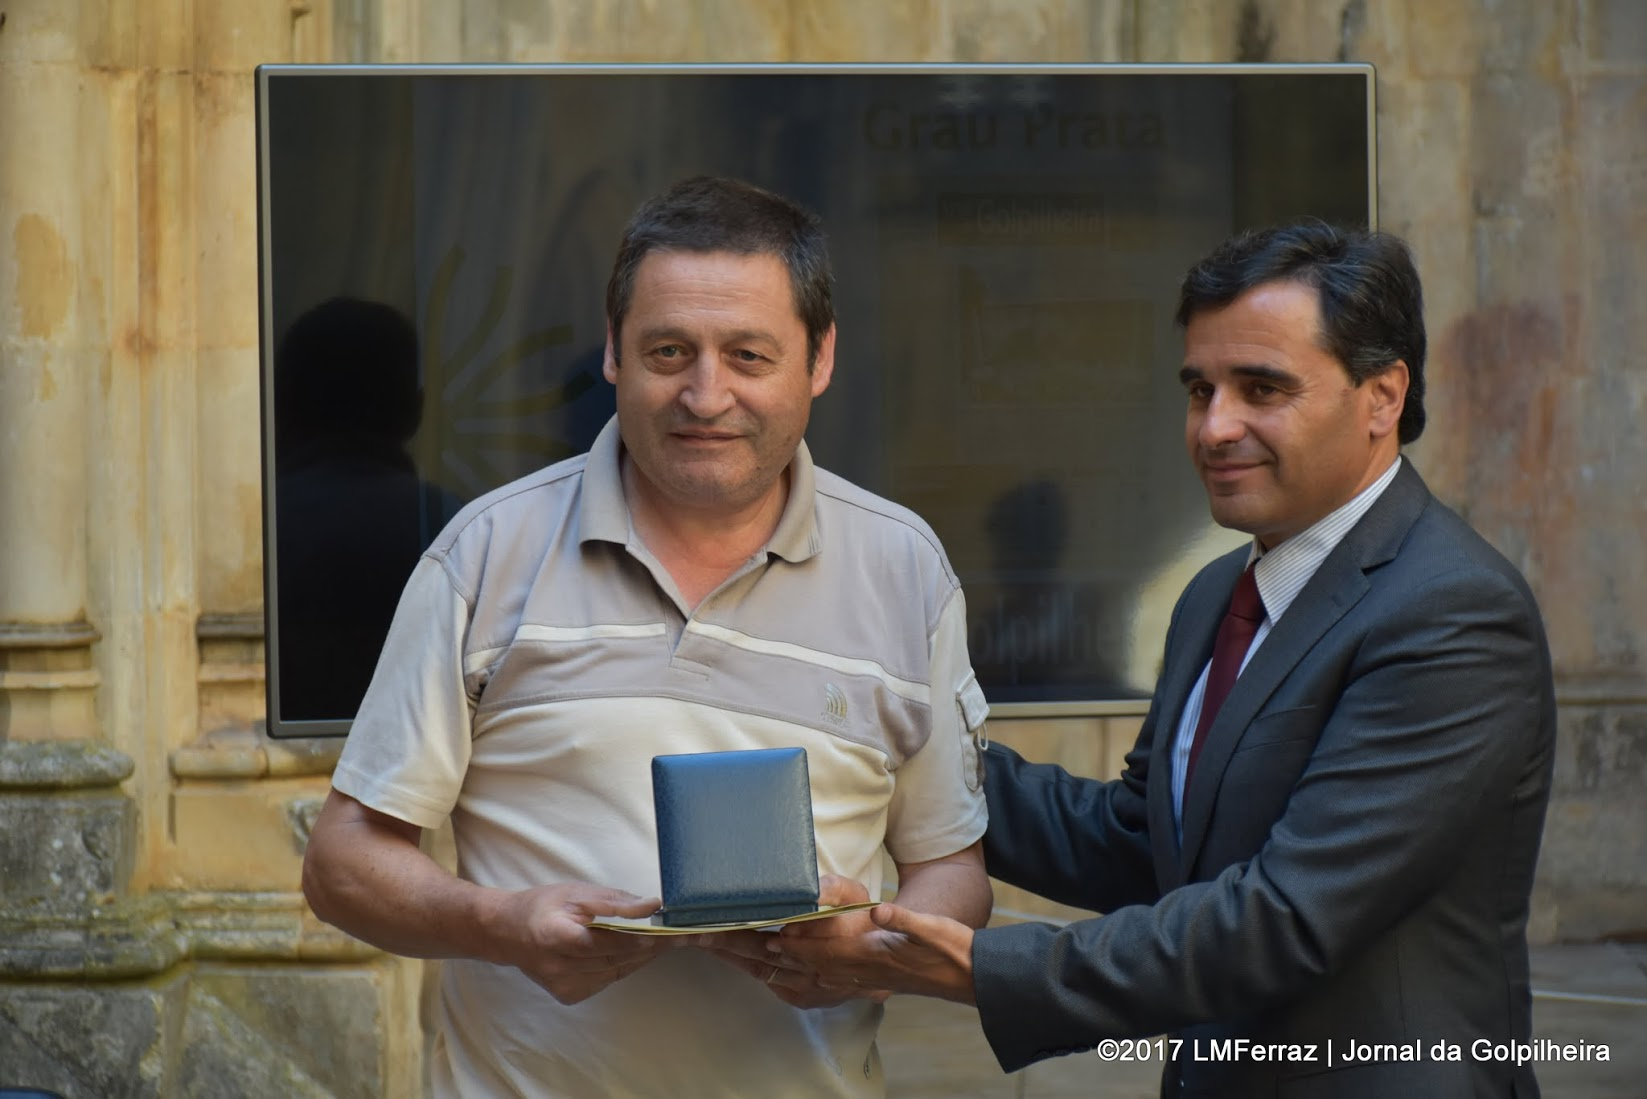 Jornal da Golpilheira recebeMedalha Municipal de Mérito